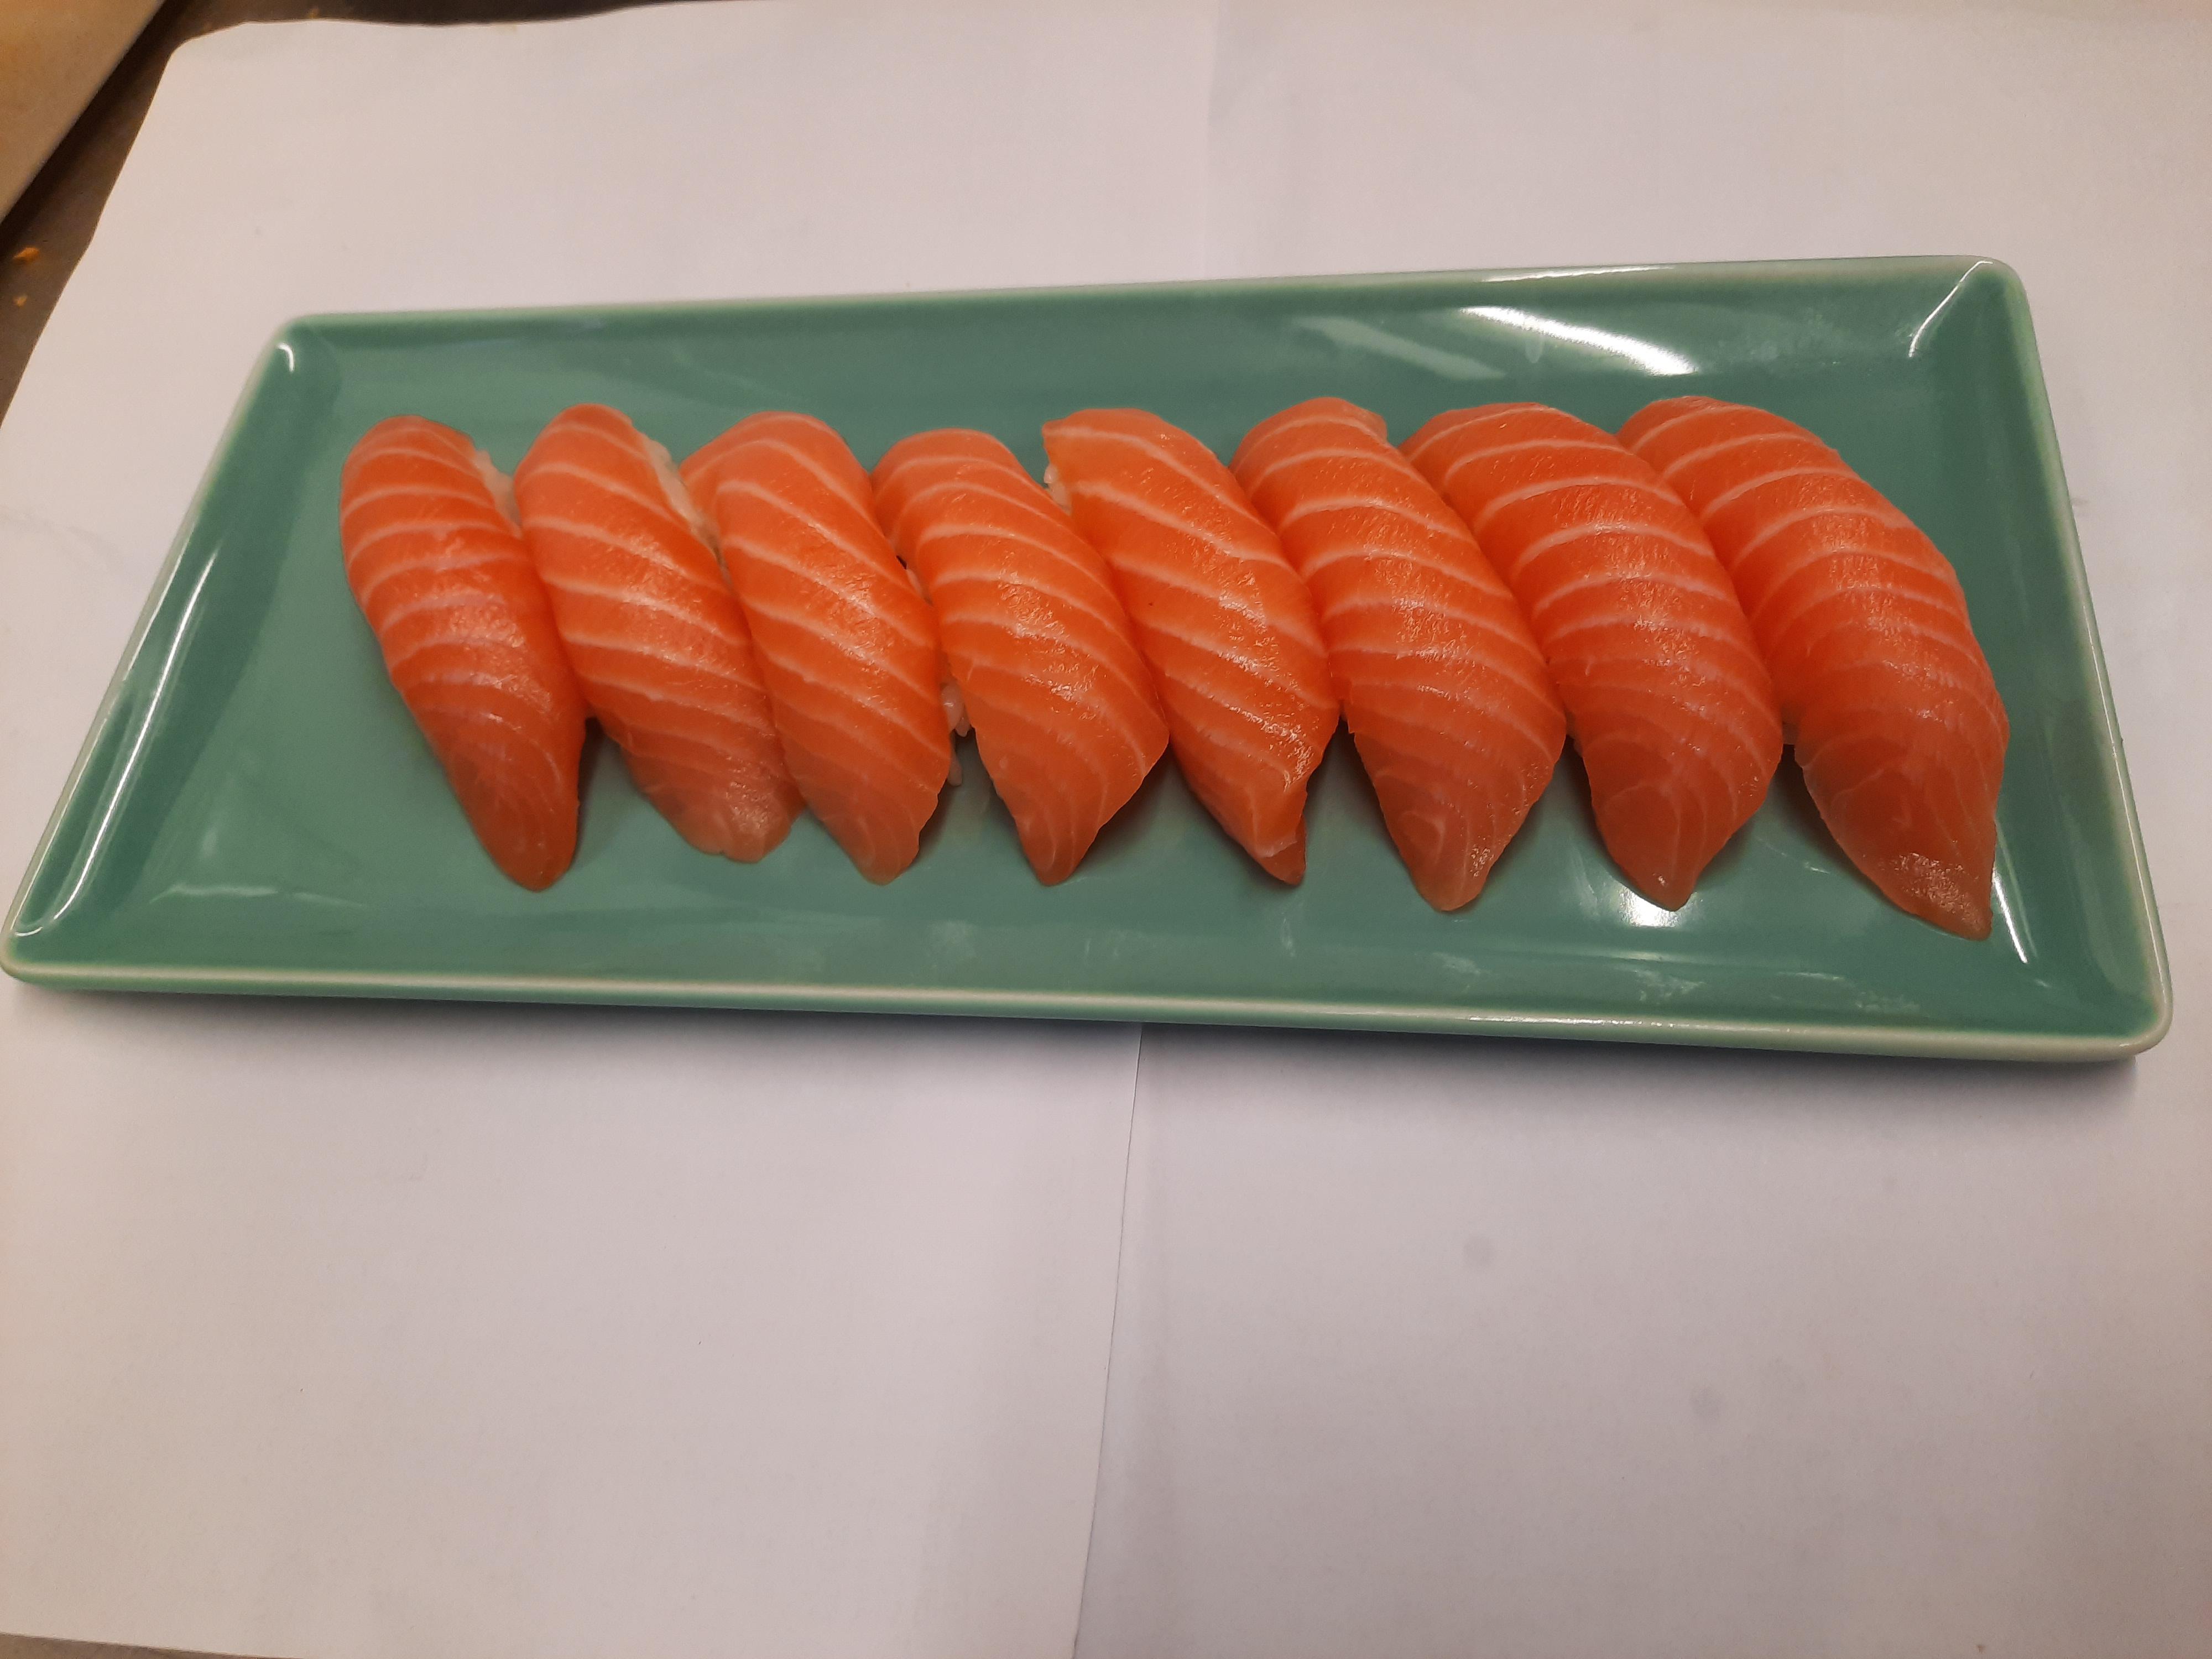 Pacific Sushi Kitchen In 53115 Bonn